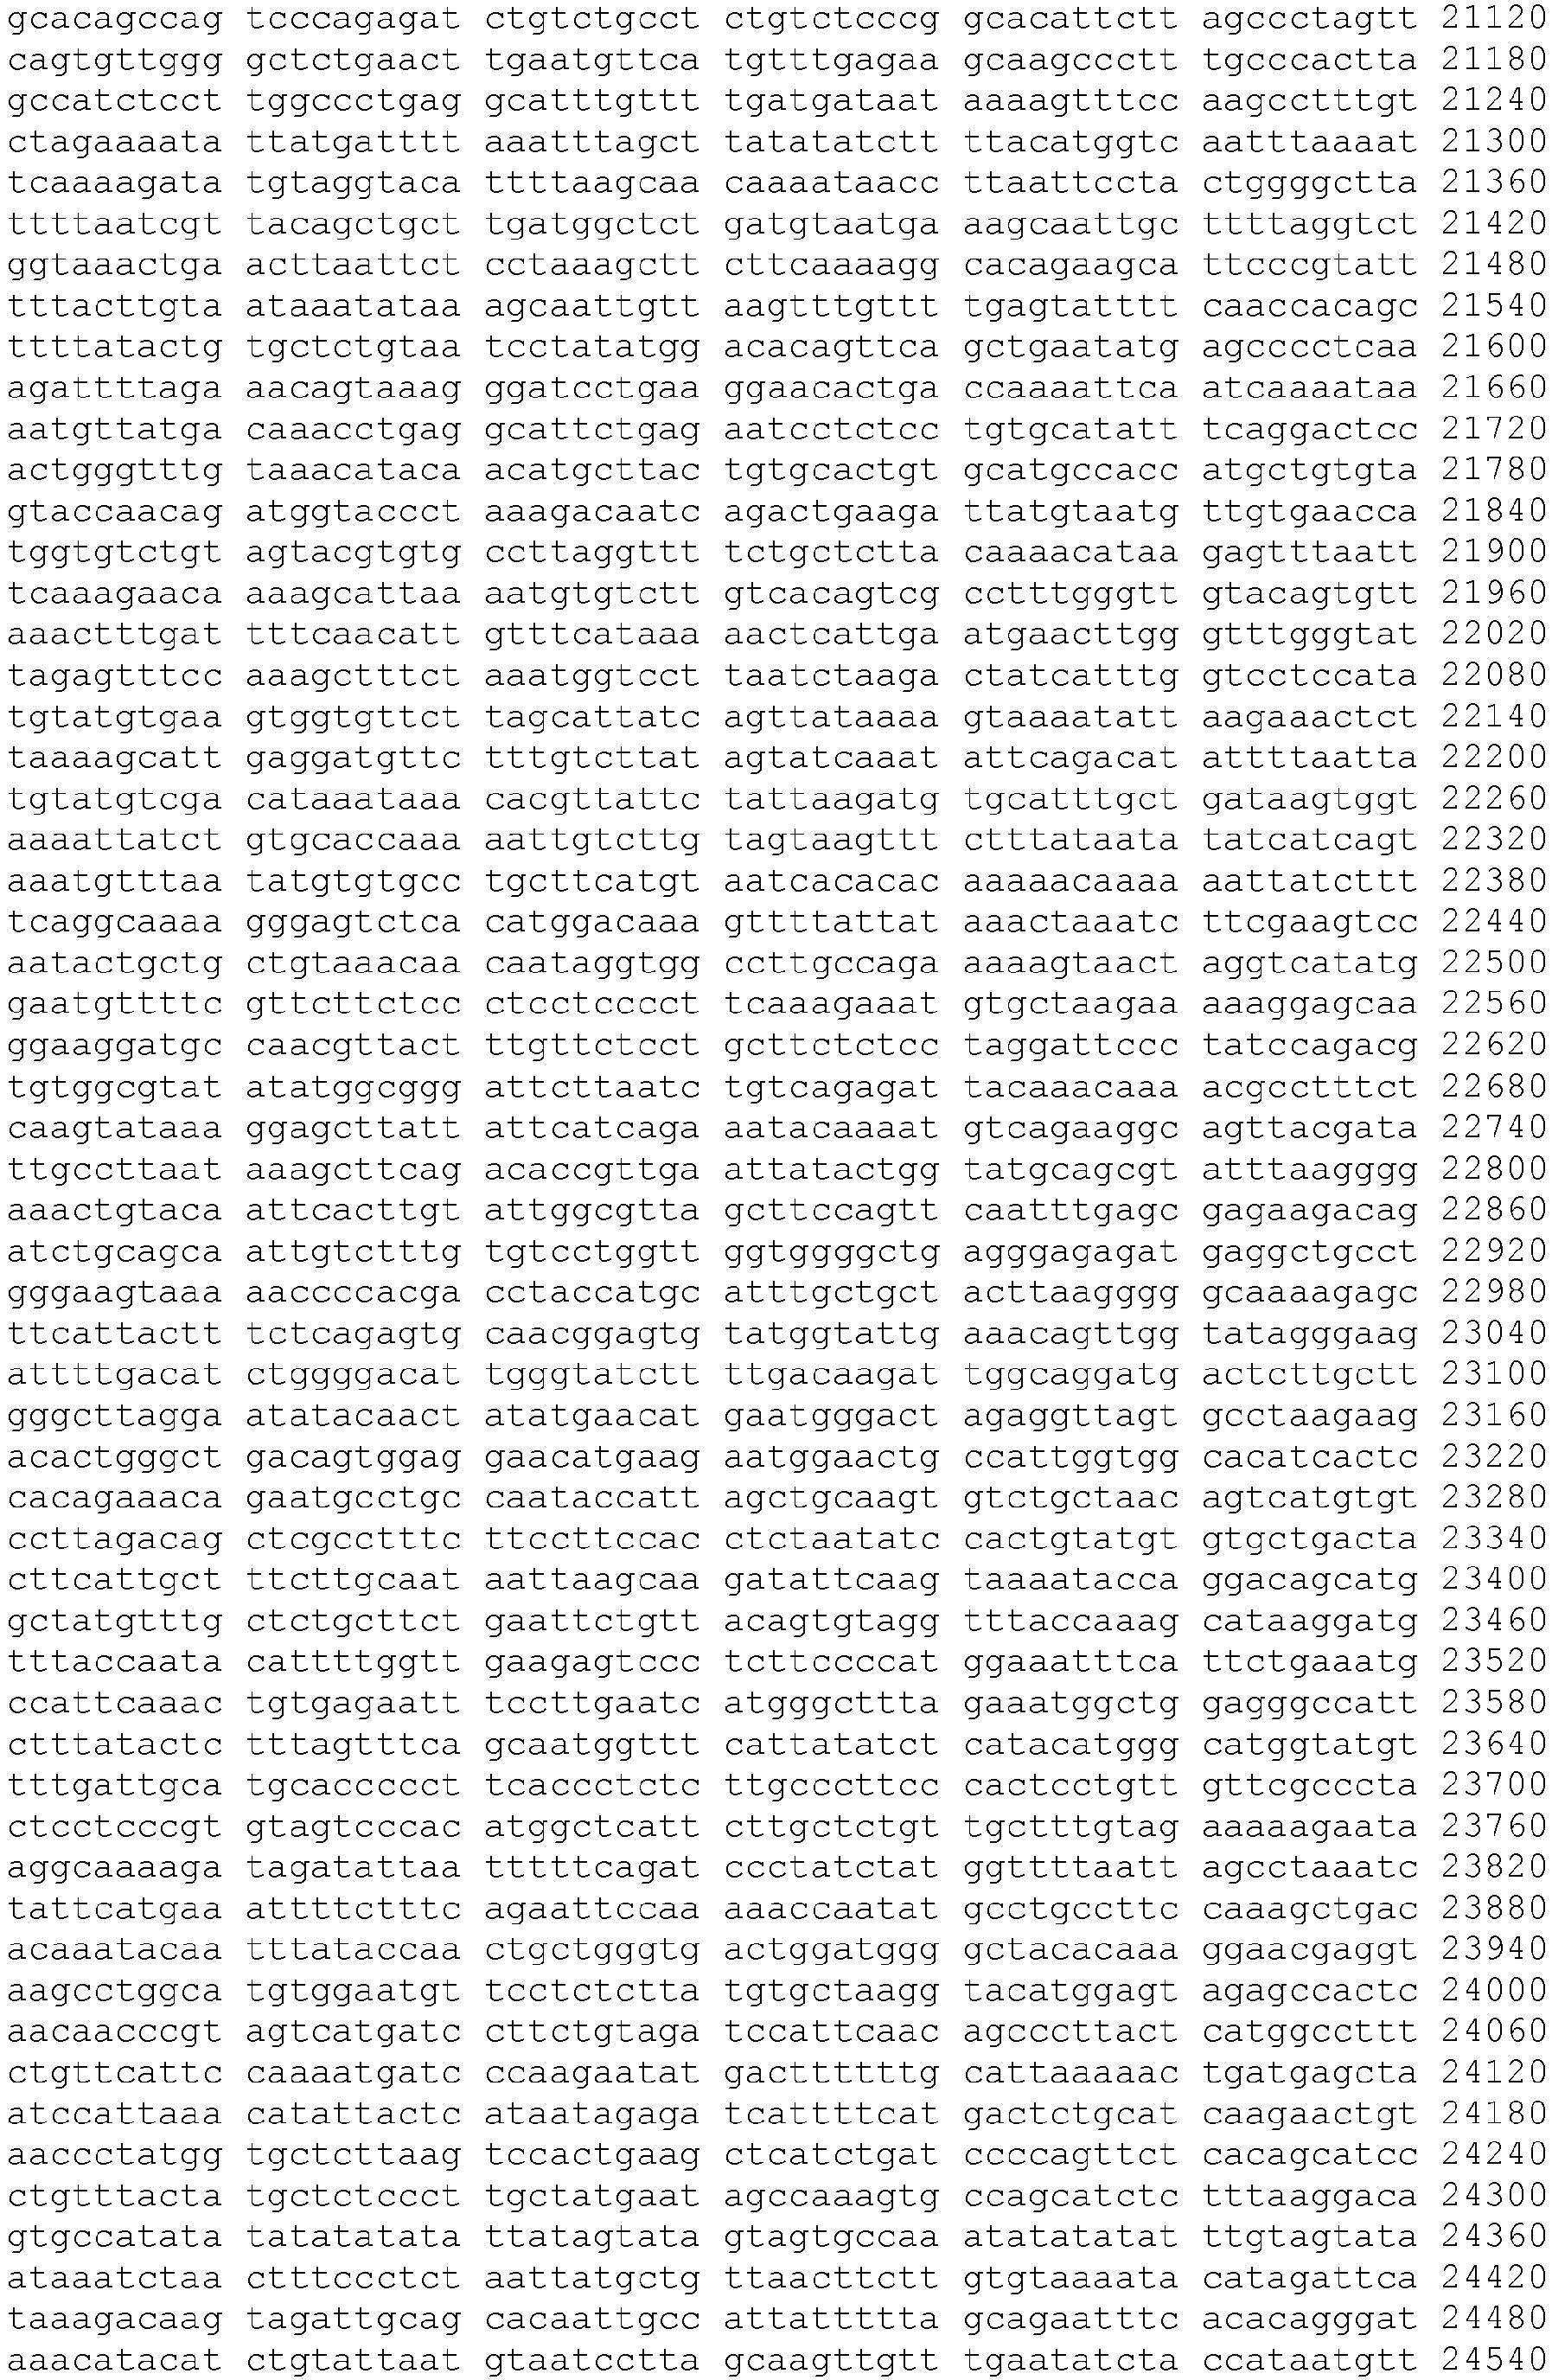 Figure imgb0067